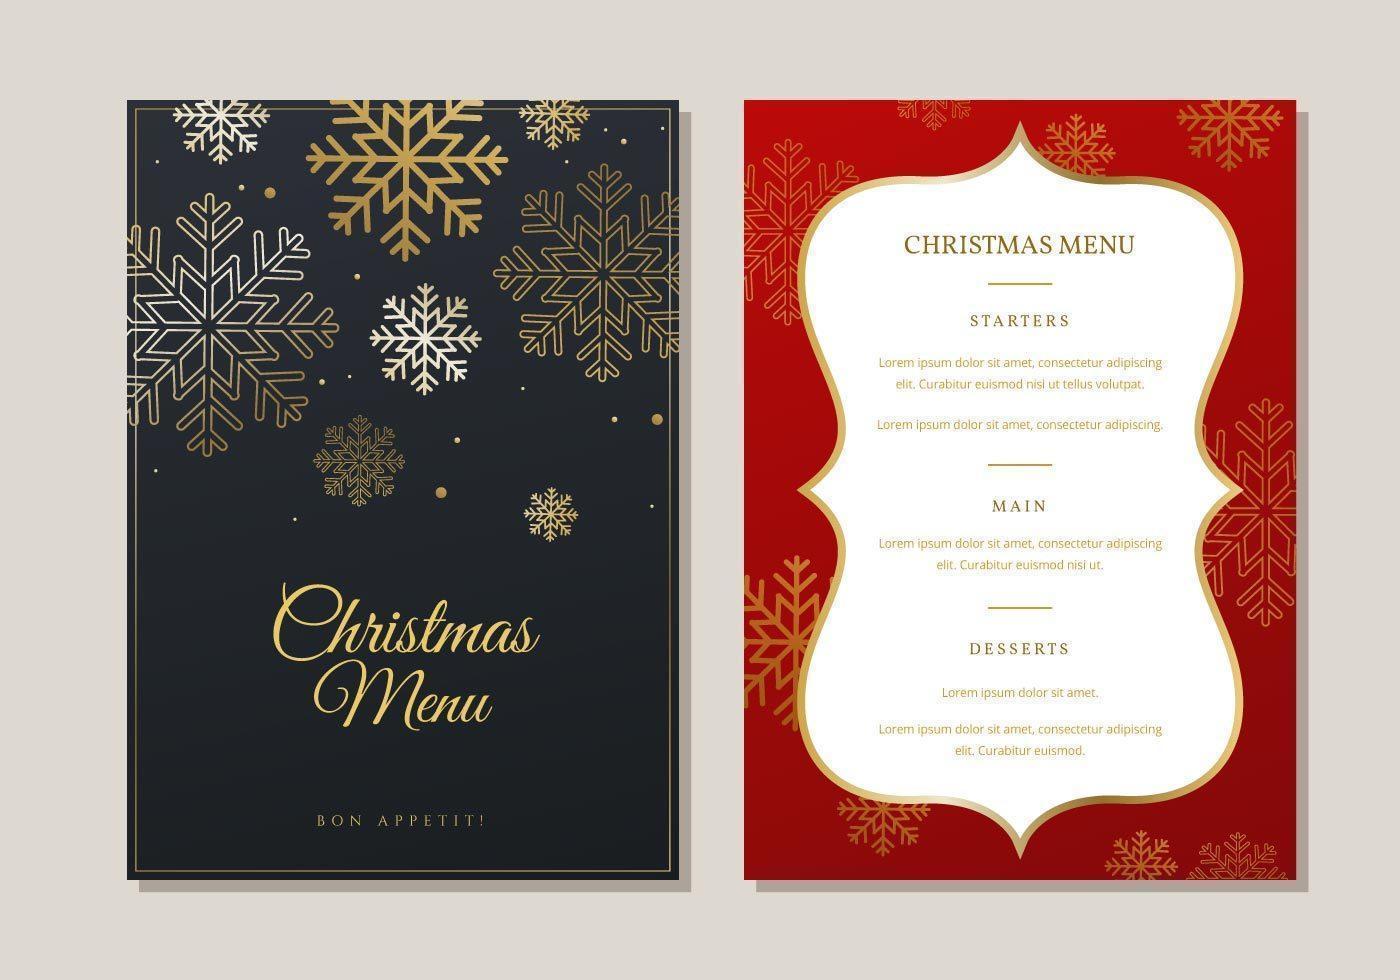 Christmas Menu Dinner Template vetor